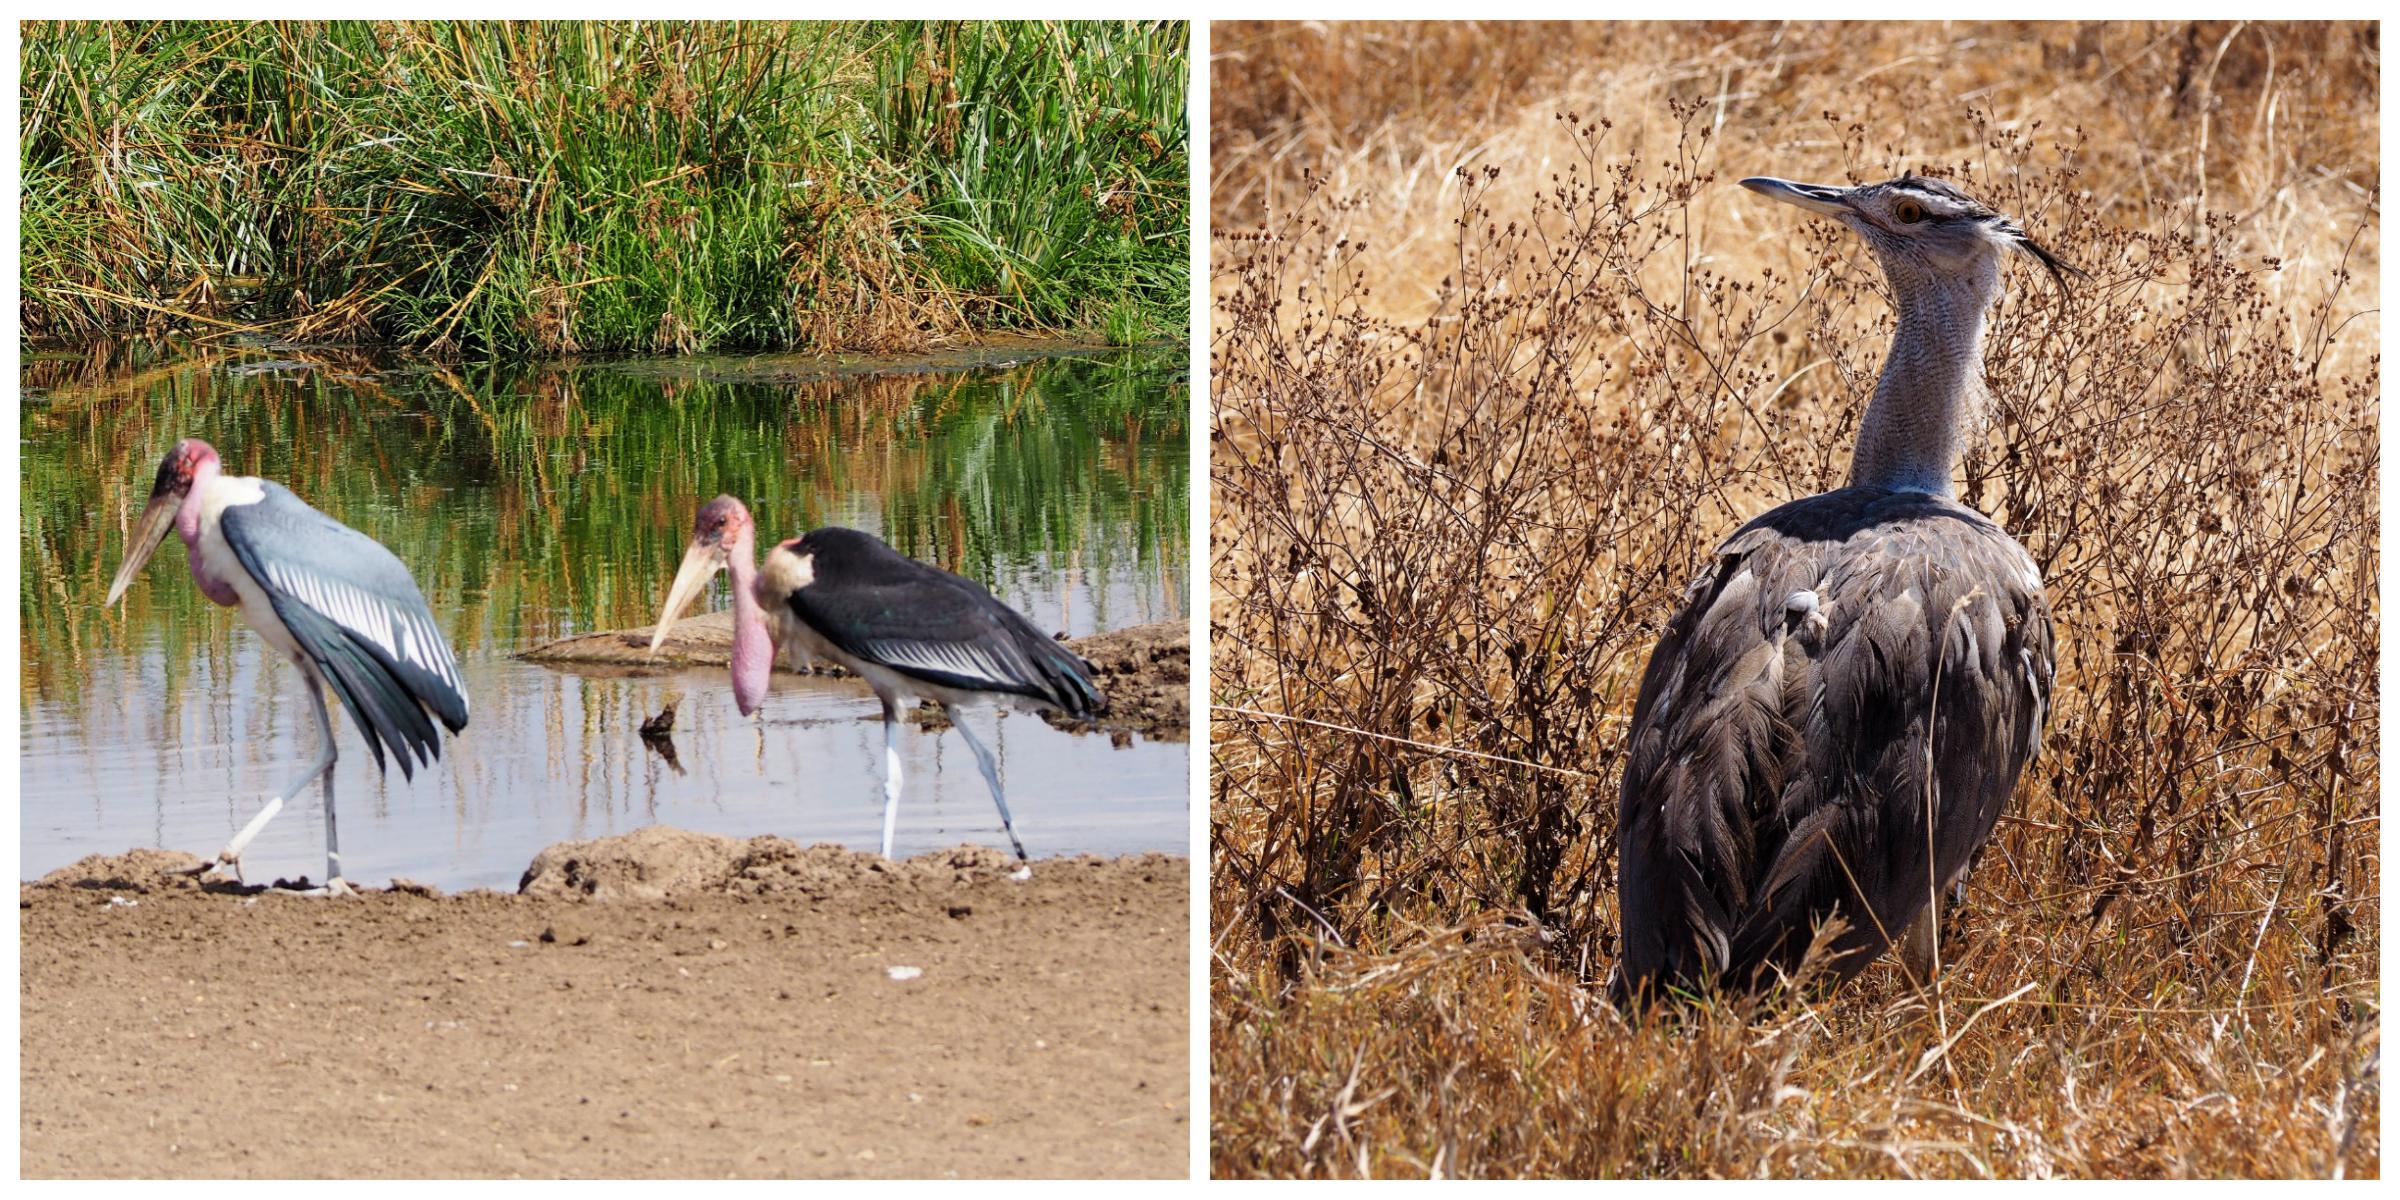 Maribou stork |